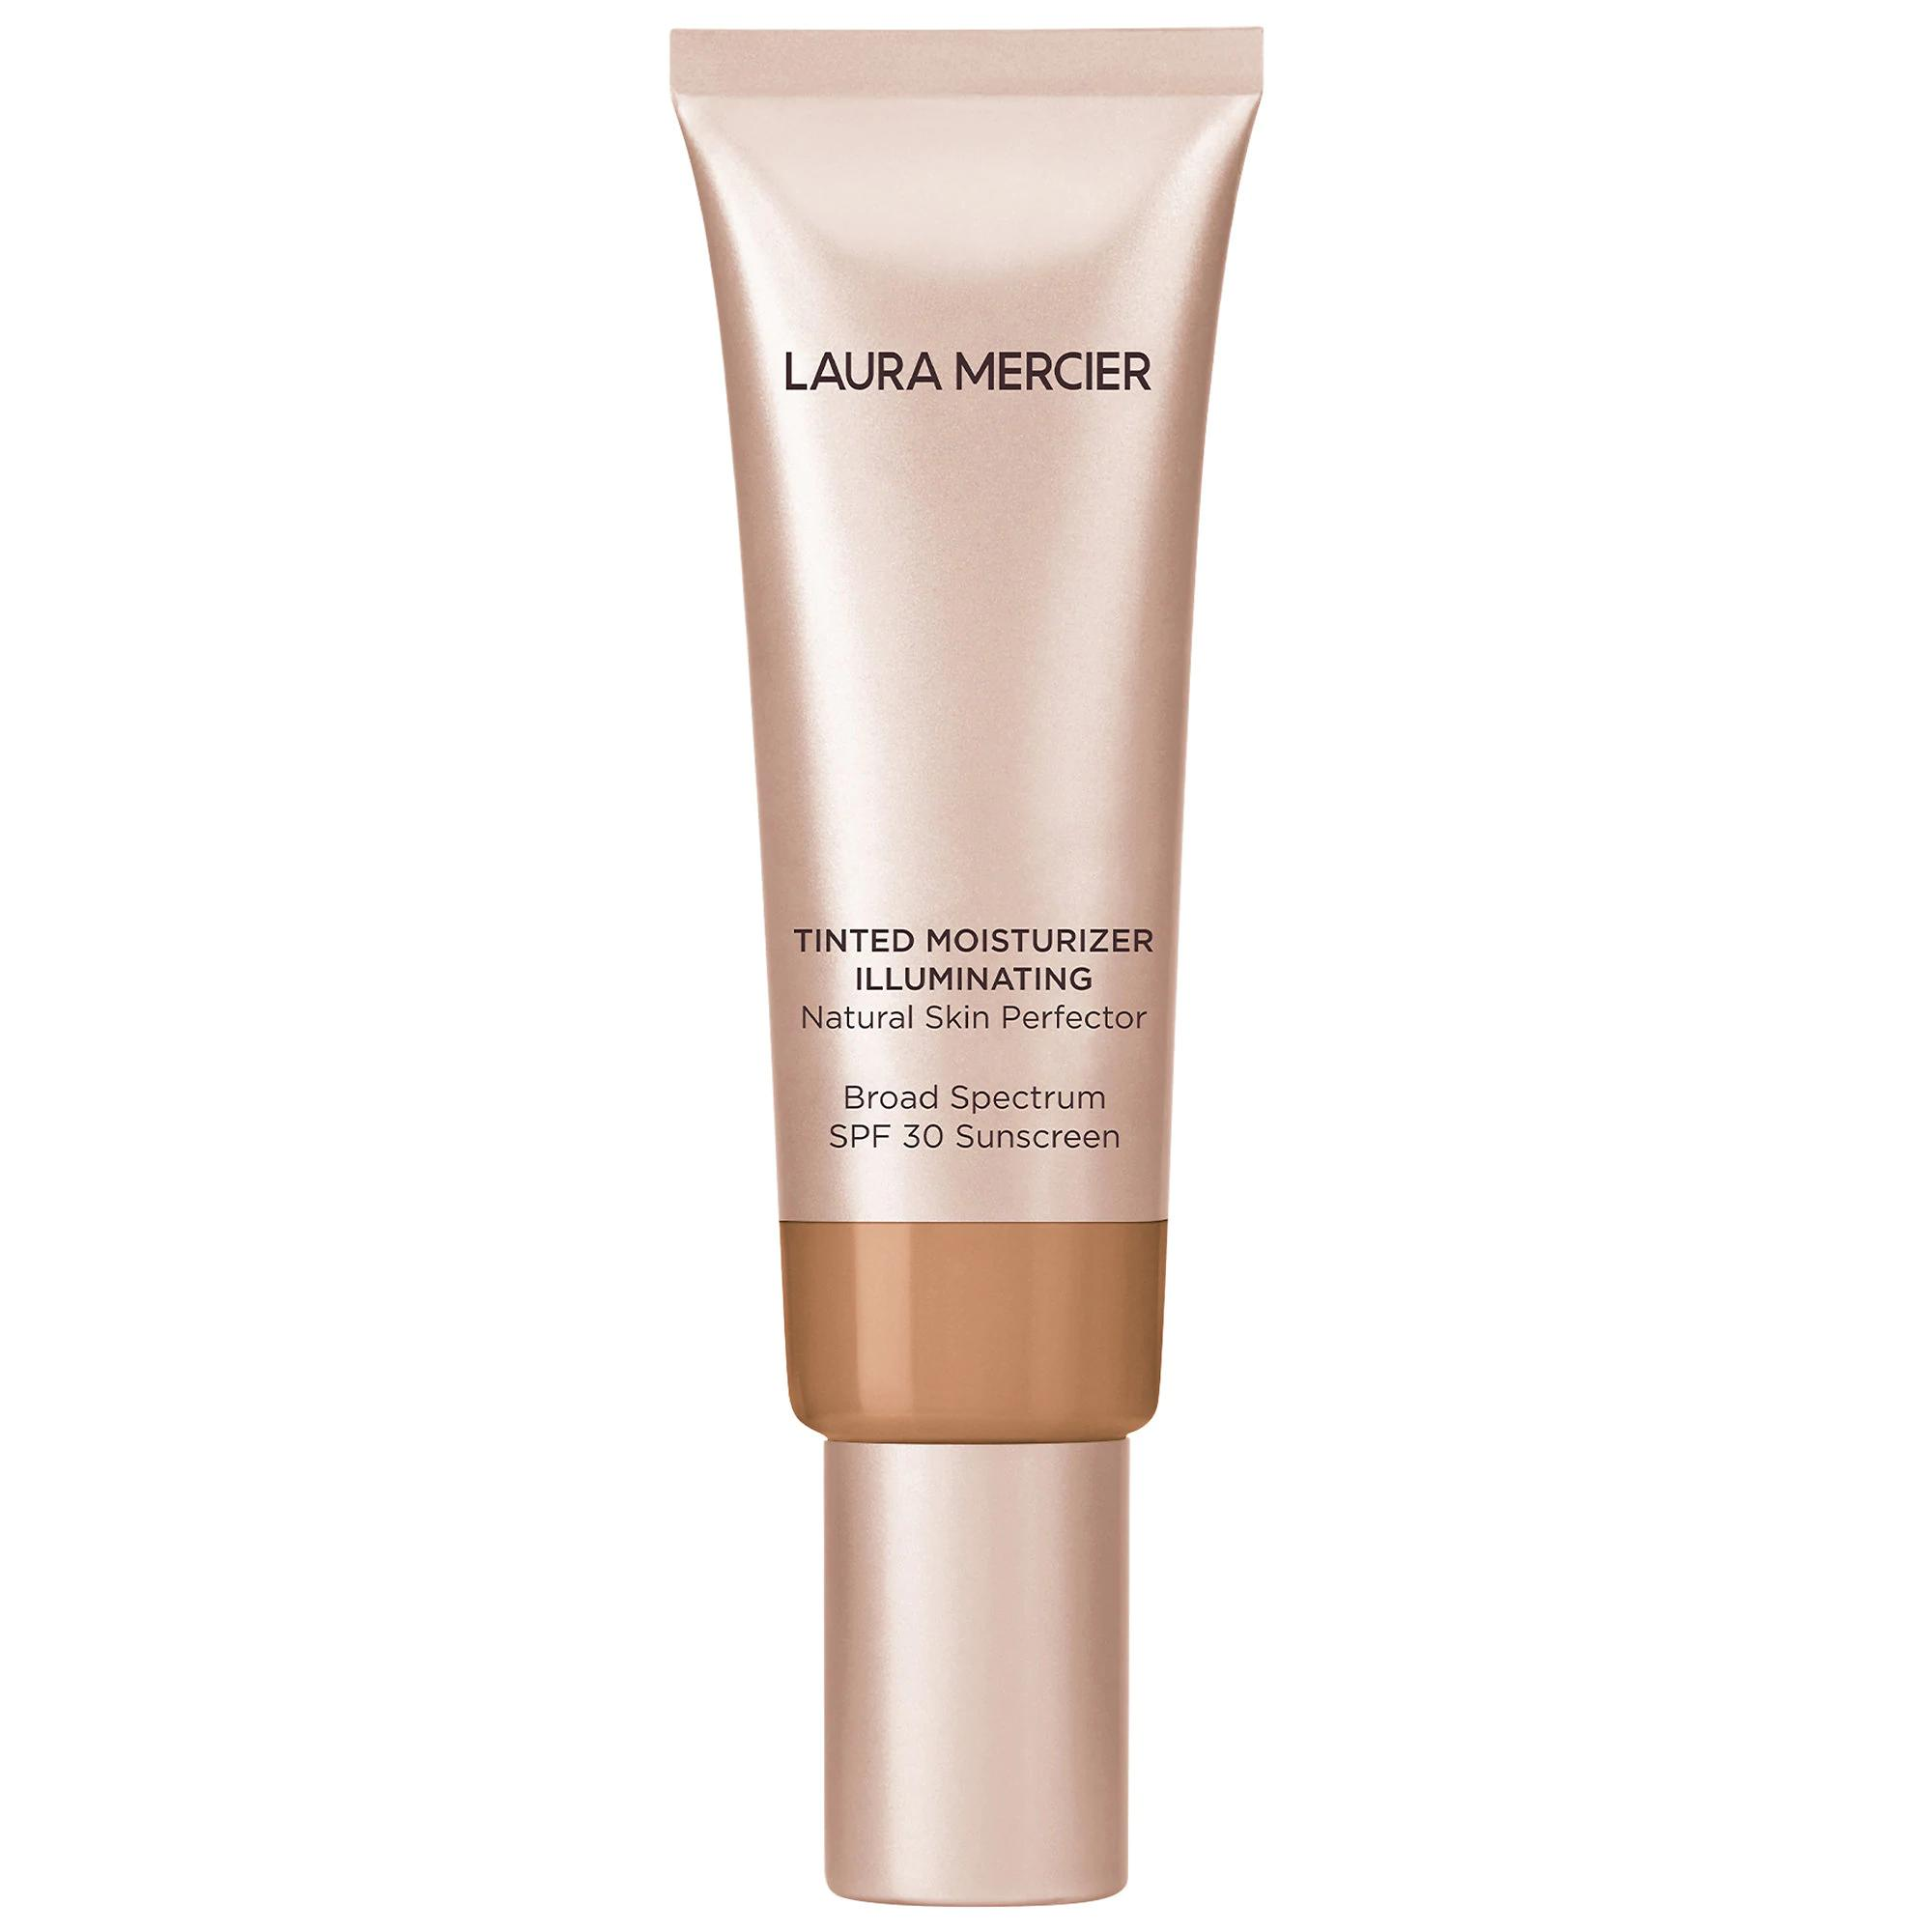 Laura Mercier Tinted Moisturizer Illuminating Natural Skin Perfector Golden Radiance